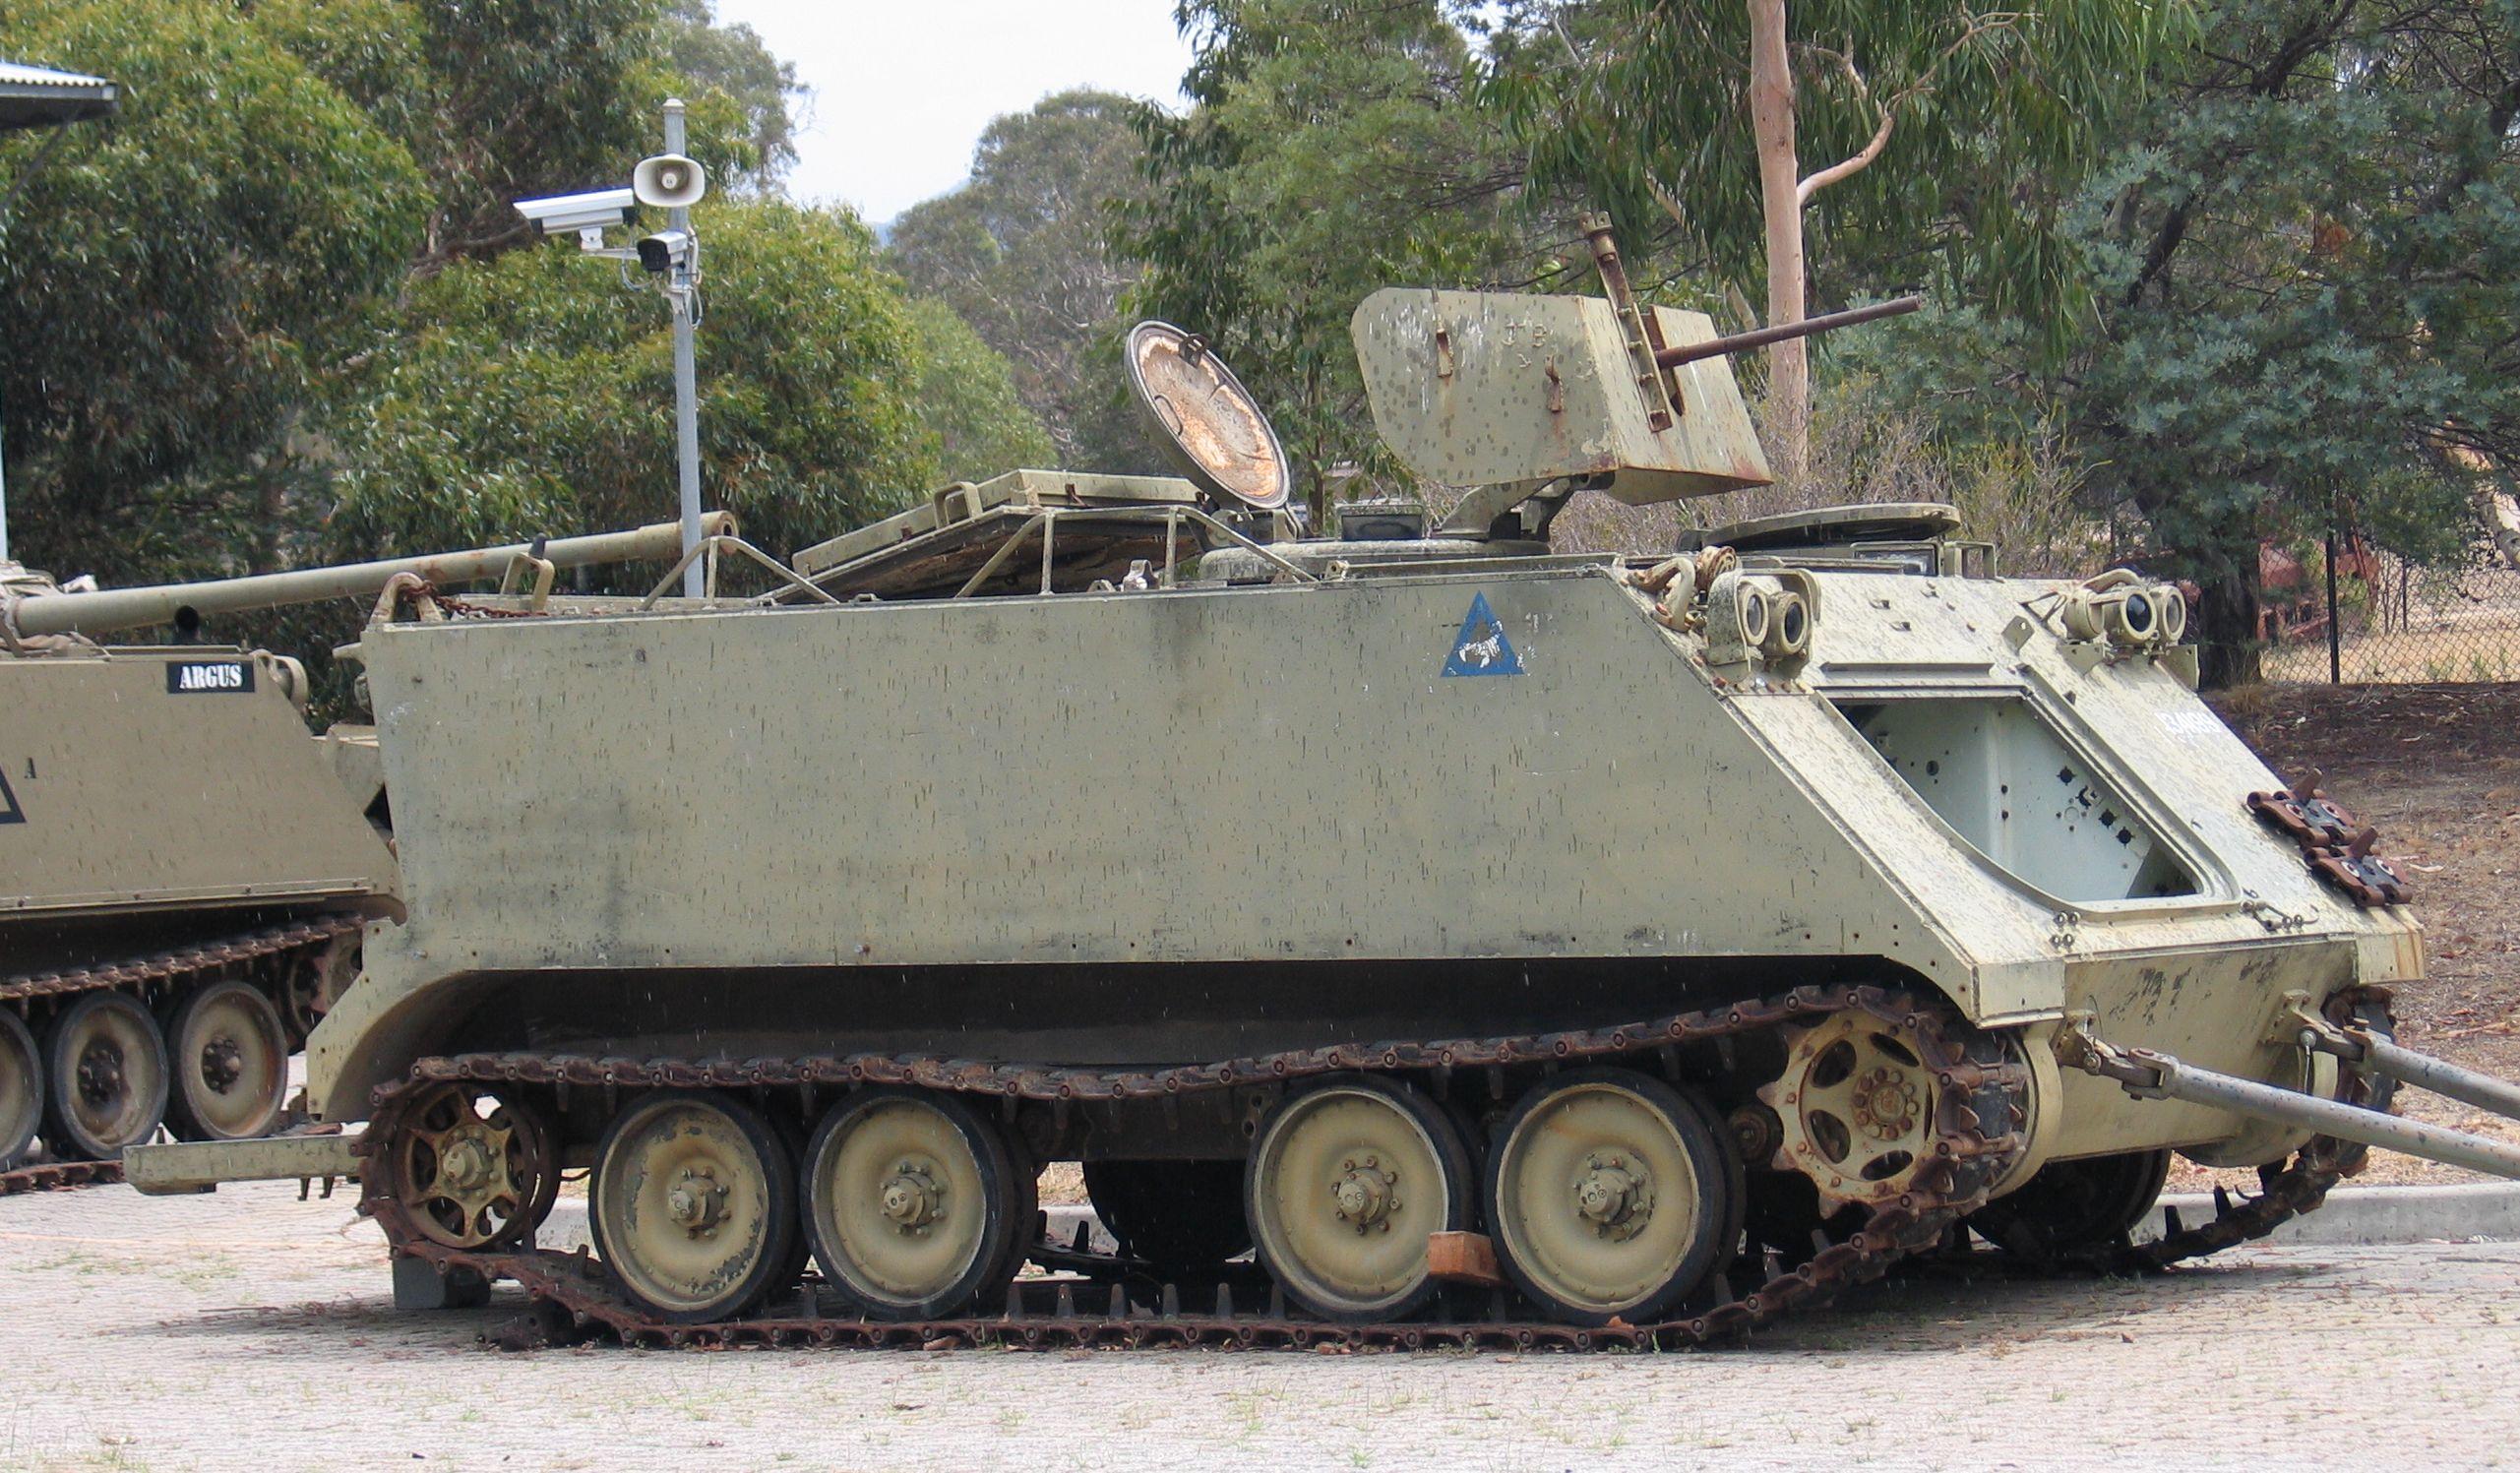 Car Carrier For Sale >> File:Puckapunyal-M113-3-1.jpg - Wikimedia Commons